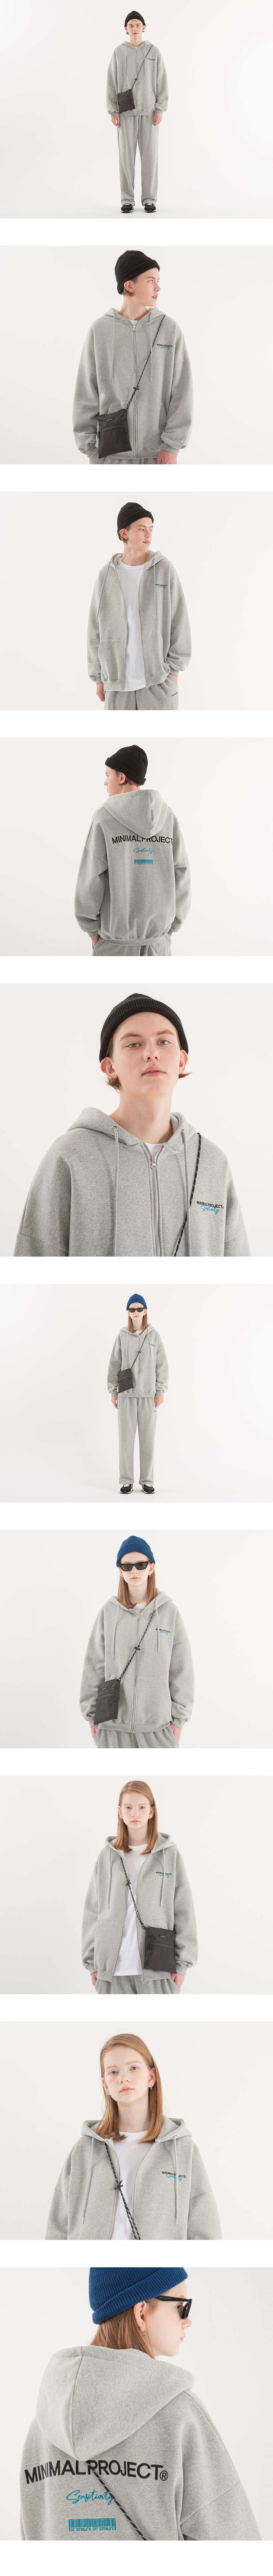 [minimal project] 미니멀프로젝트 바코드 자수 오버핏 후드집업 MZT103 [MELANGE]